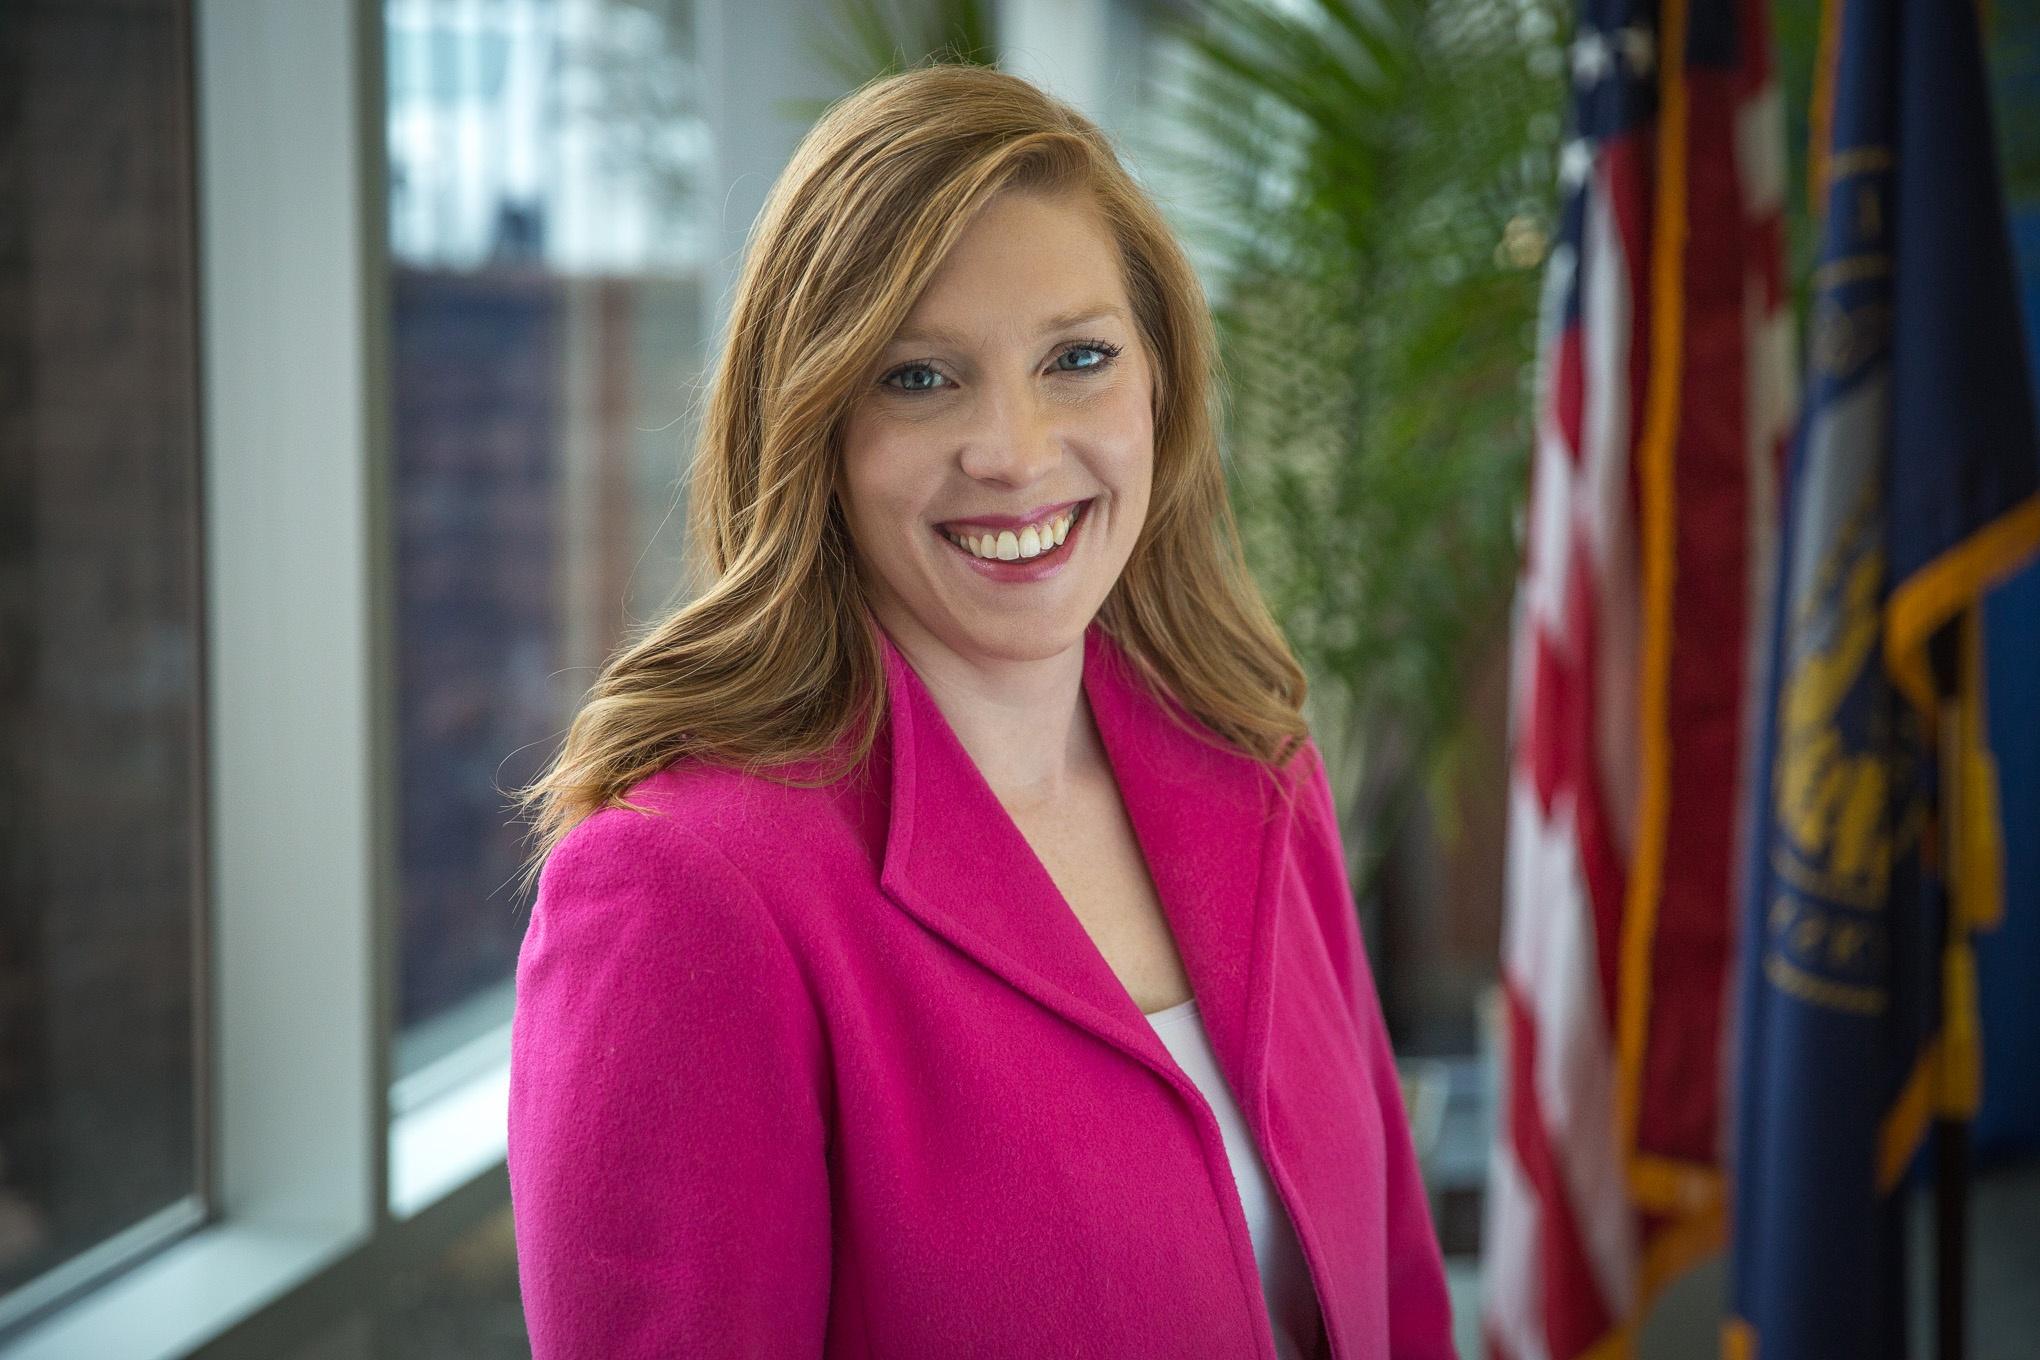 photo of NMC alum Anne Boatright beside U.S. and Nebraska flags.